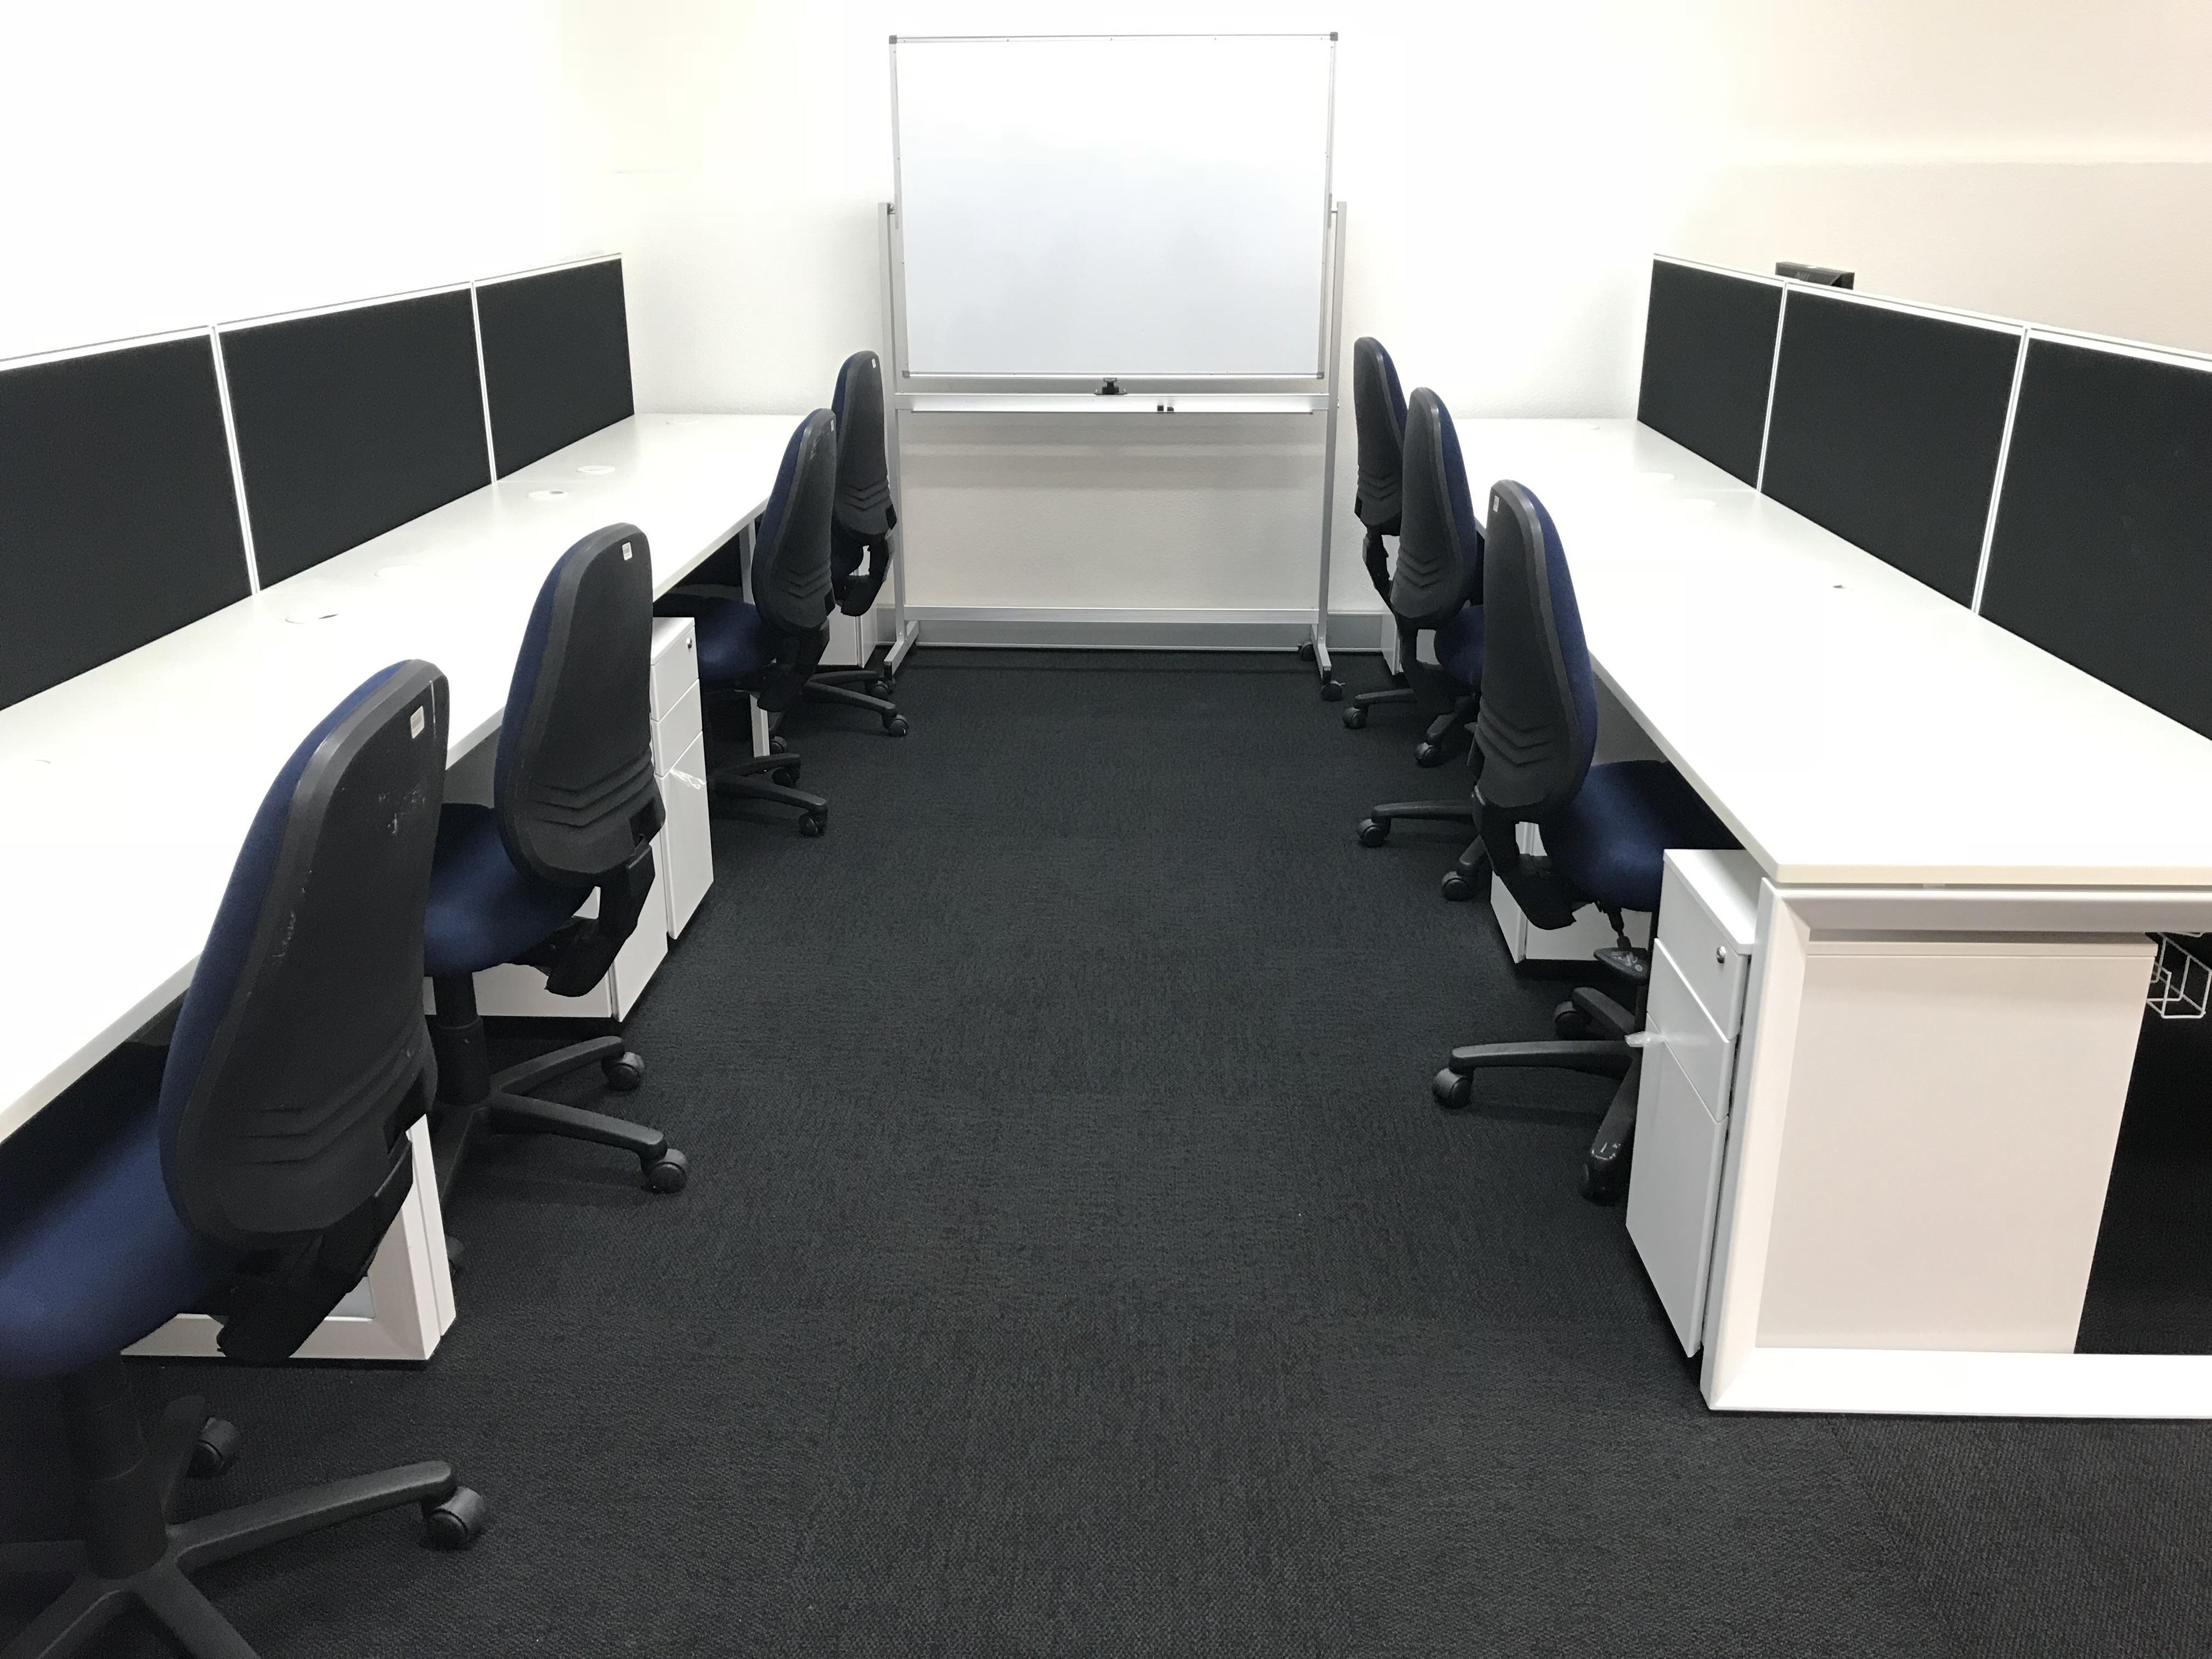 Incubate IT - Standard Desk (1200mm) South Space